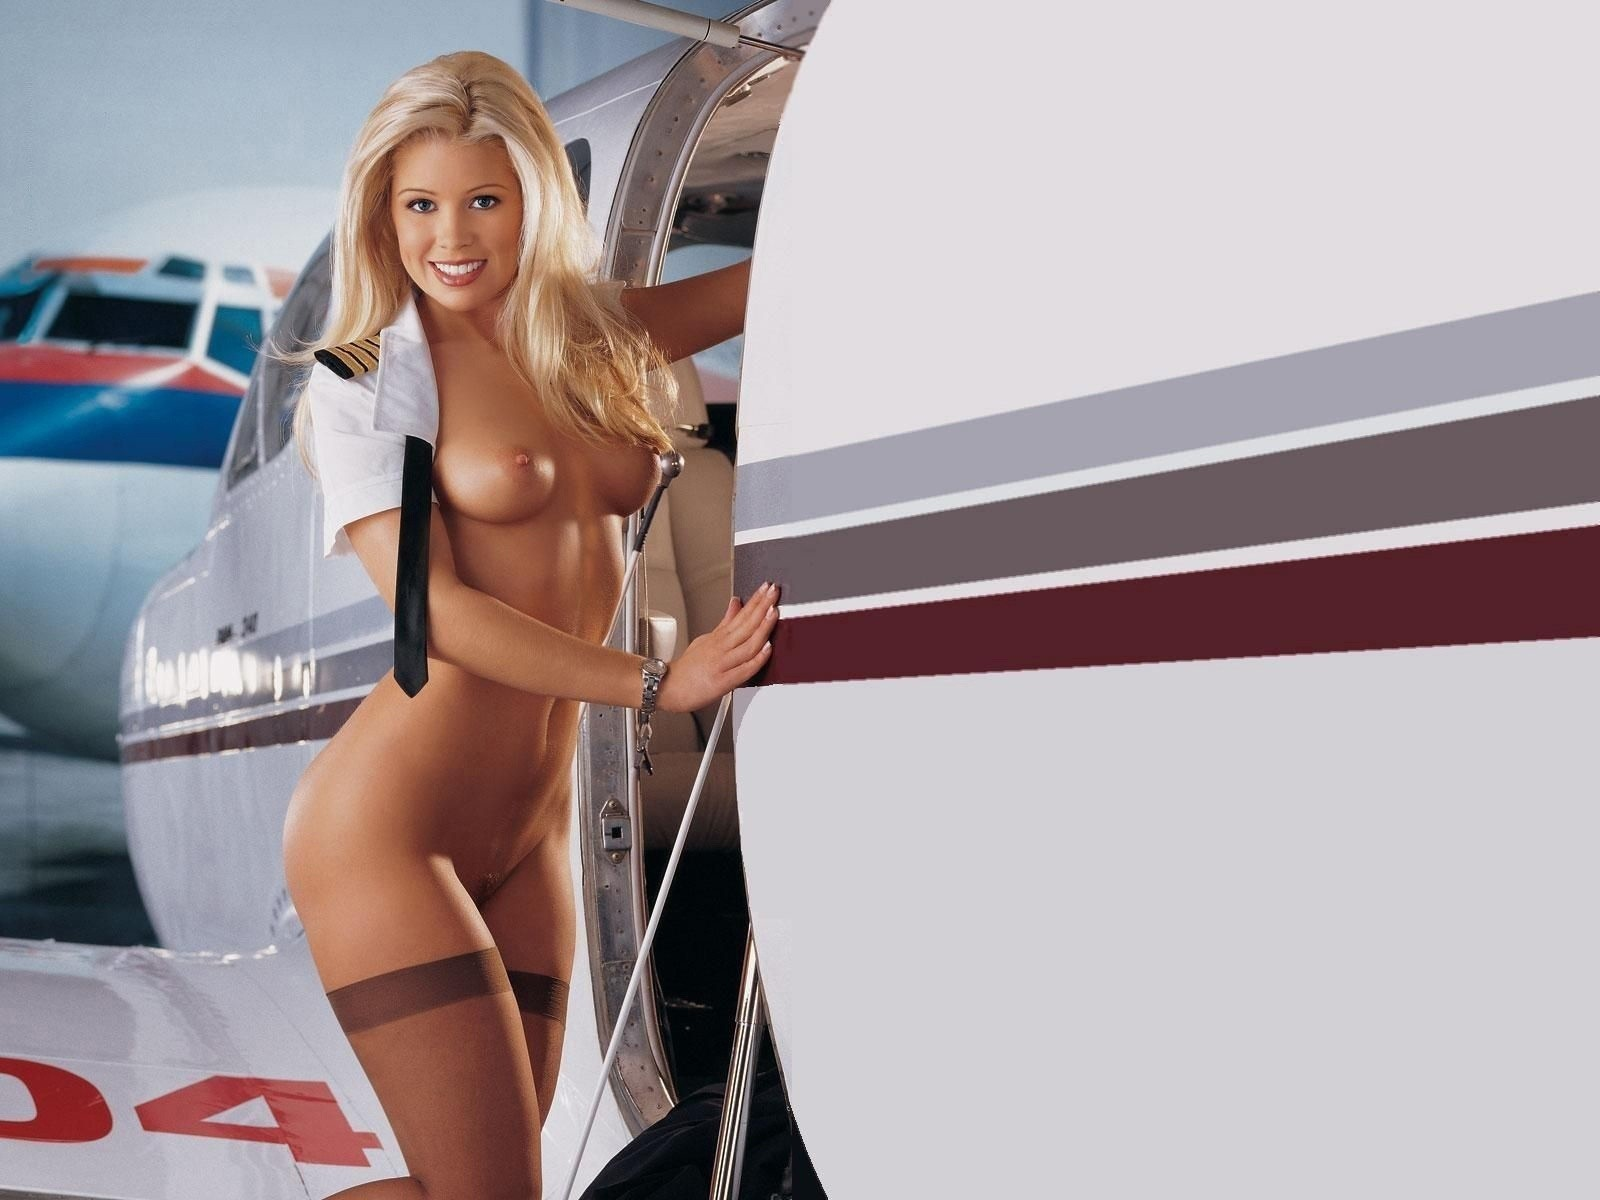 air-hostess-sexy-nude-fucking-real-sex-satanic-porn-images